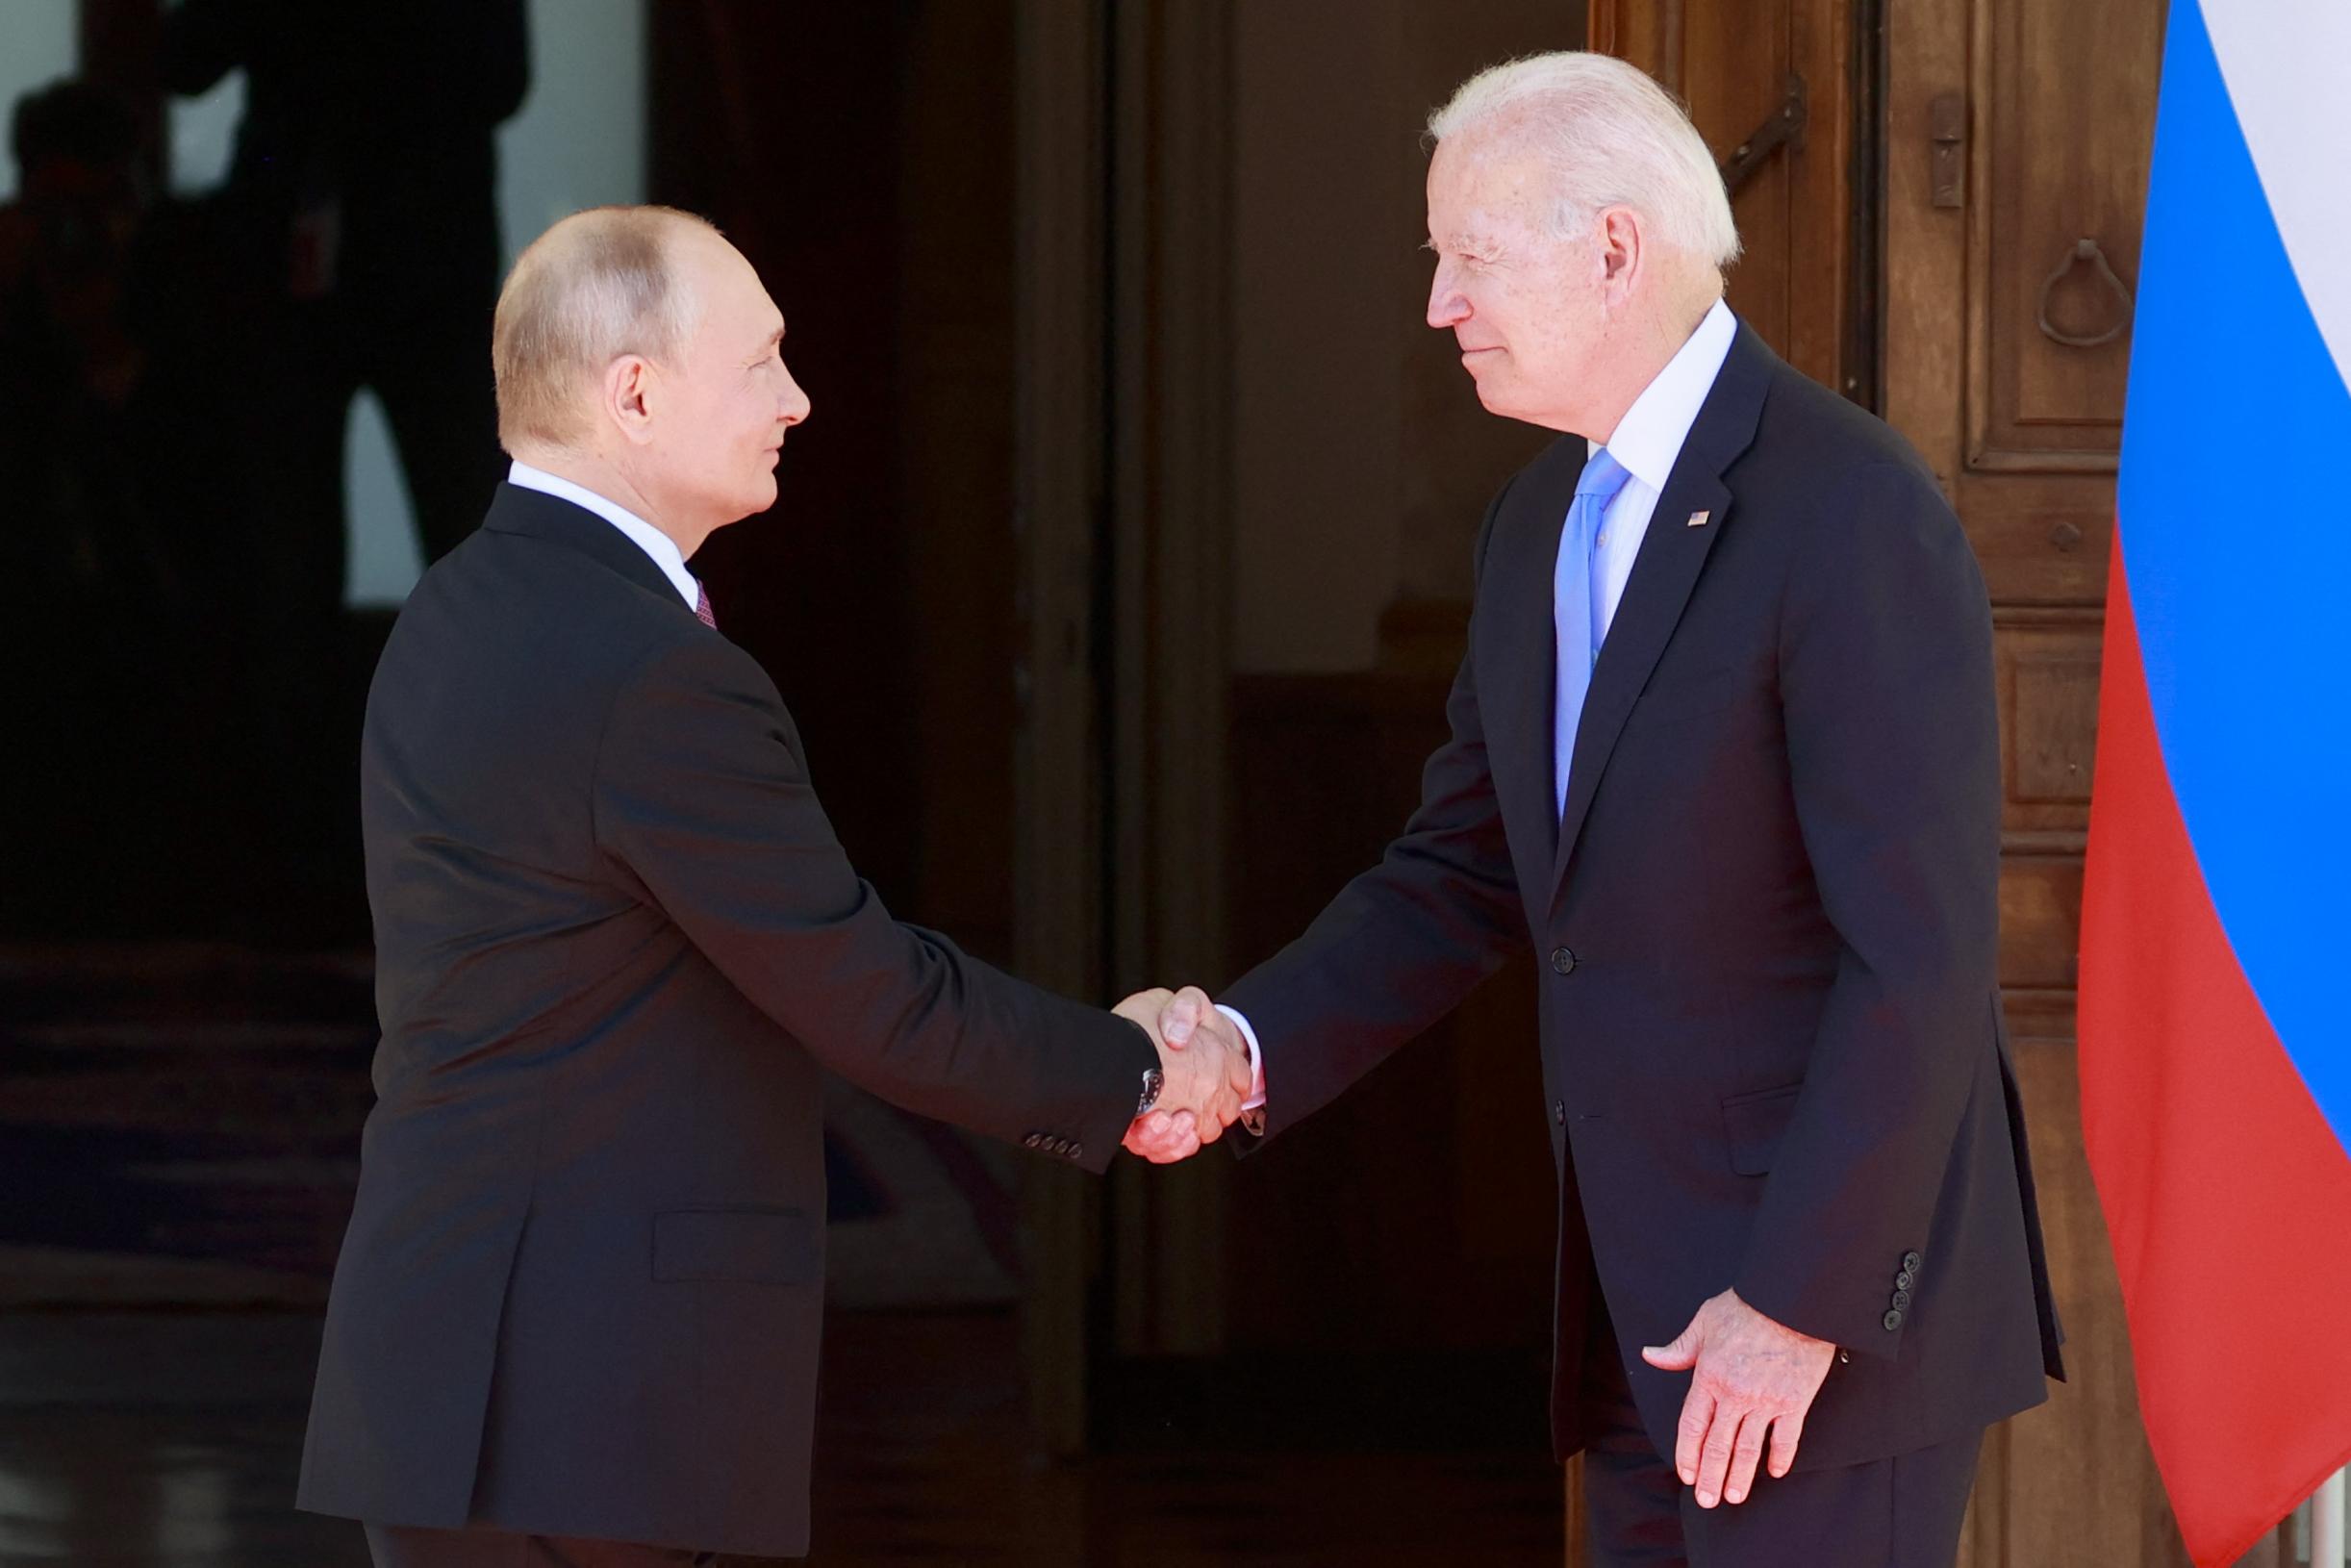 President Joe Biden meets with Vladimir Putin in Geneva. (Photo by DENIS BALIBOUSE/POOL/AFP via Getty Images)